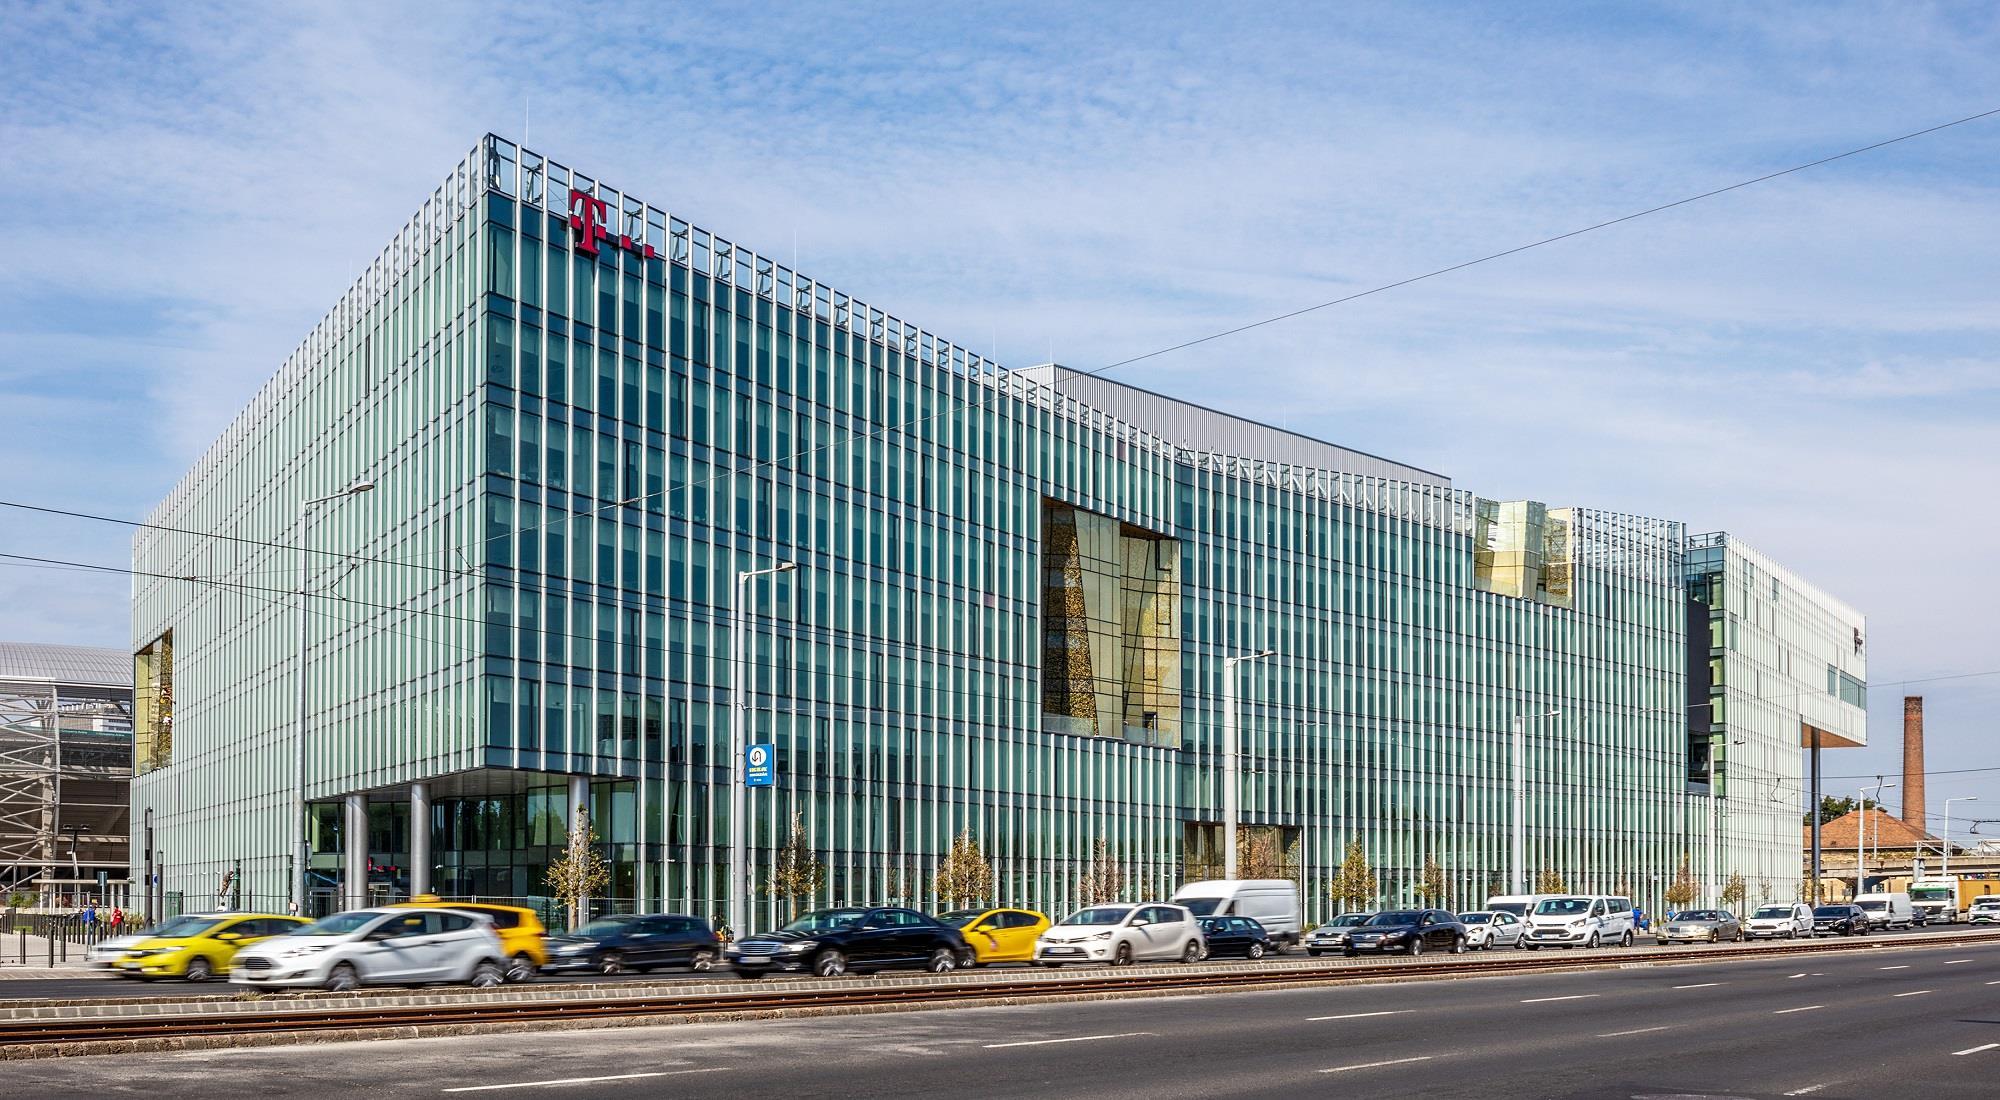 https://alukoenigstahl.mk/wp-content/uploads/2020/09/Telekom1.jpg